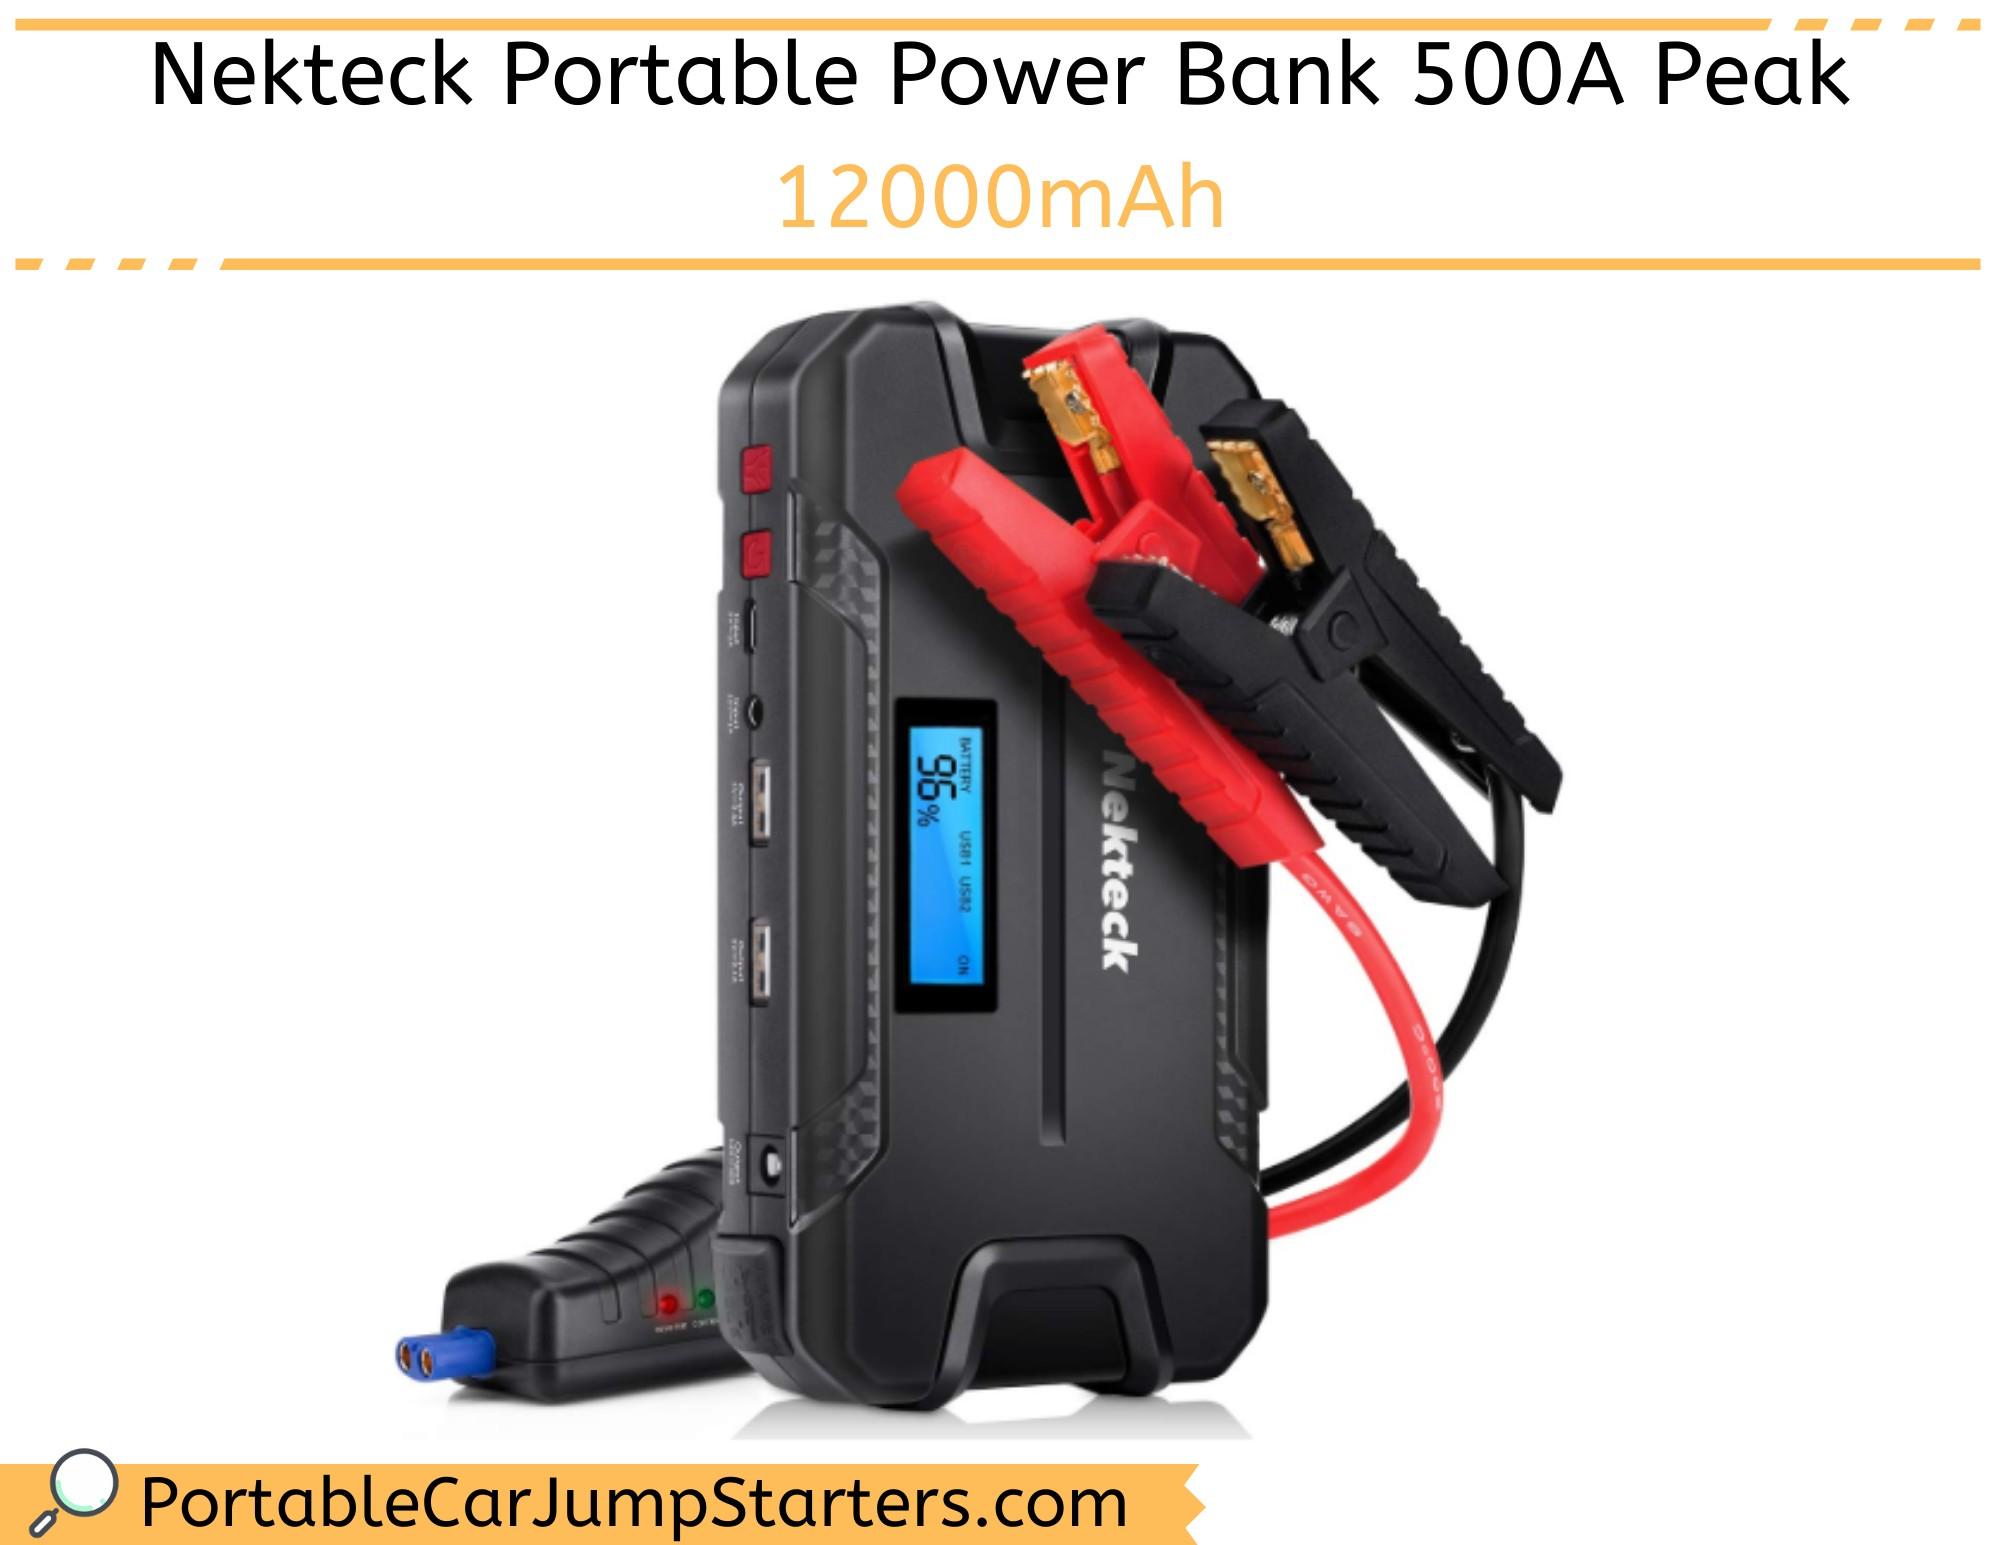 Thumbnail for Nekteck Portable Power Bank 500A Peak 12000mAh